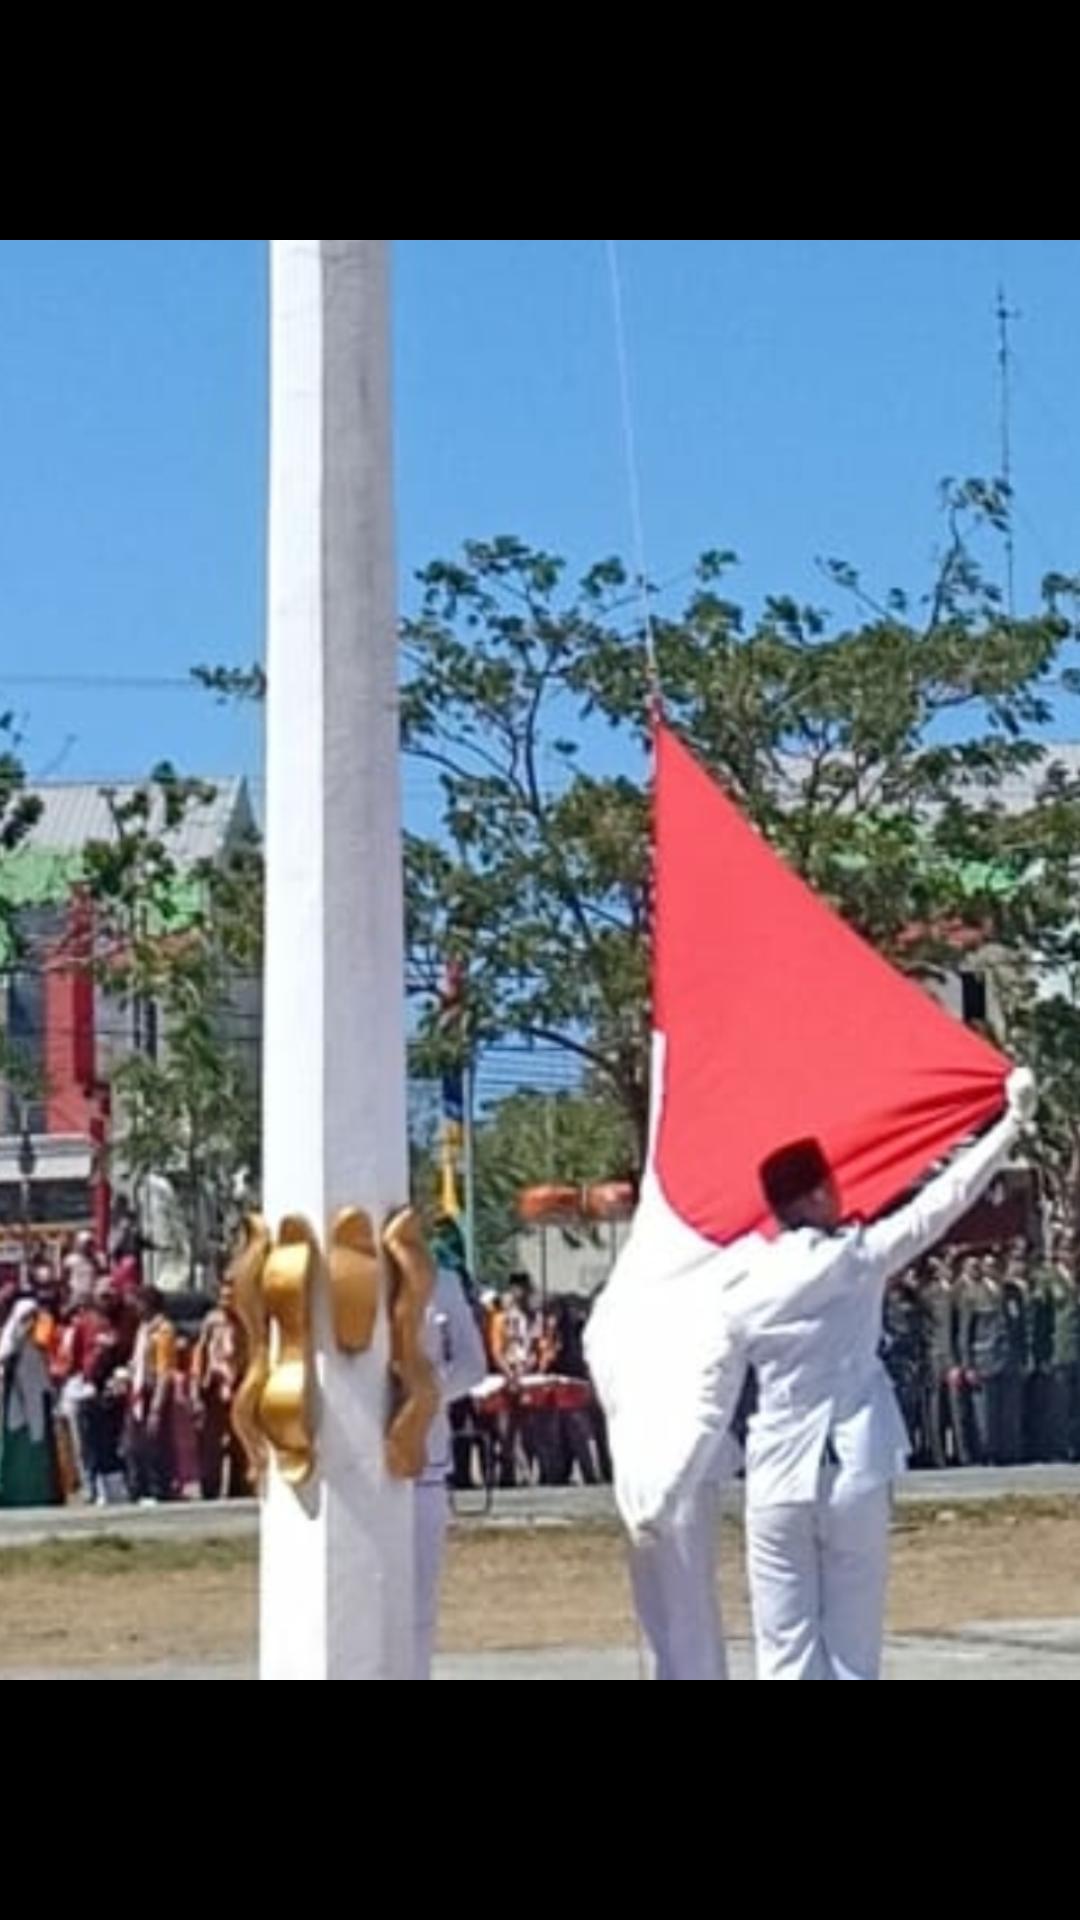 Pengibaran bendera merah putih pada detik-detik Proklamasi Kemedekaan R.I. ke-74 Tahun 2019 Tingkat Kab. Jeneponto di Lapangan Passamaturukang